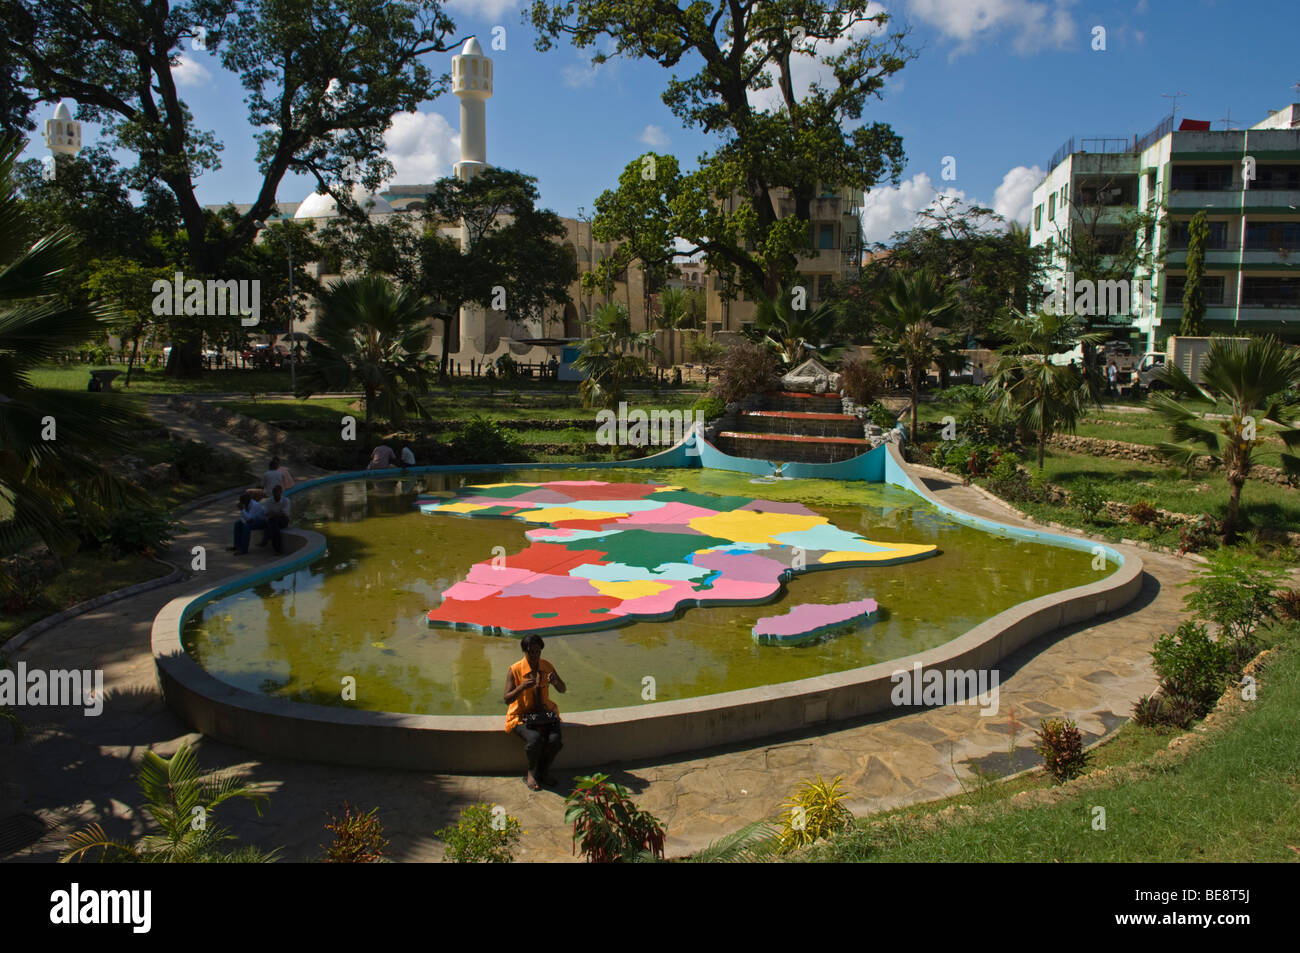 Africa-shaped Fountain, Uhuru Gardens, Mombasa, Kenya